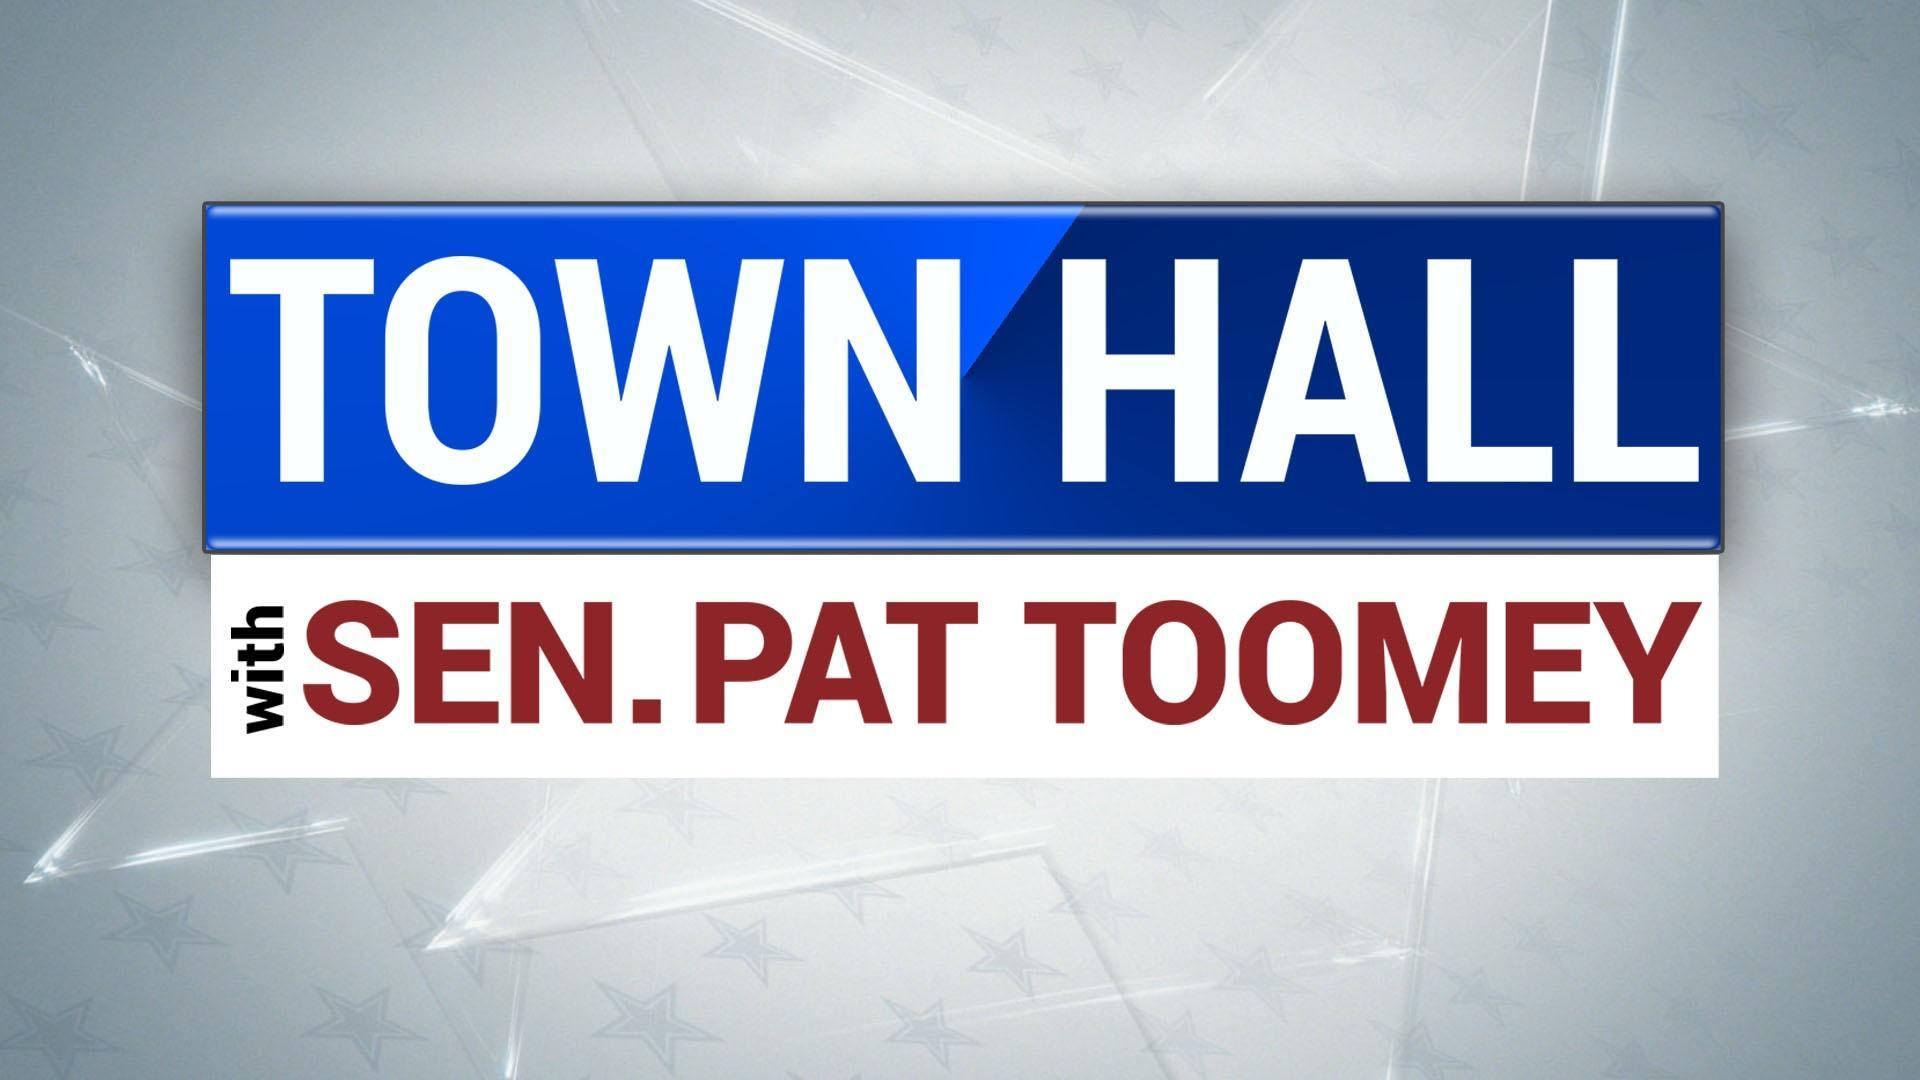 PBS39 to Host Town Hall Meeting with  U.S. Senator Pat Toomey